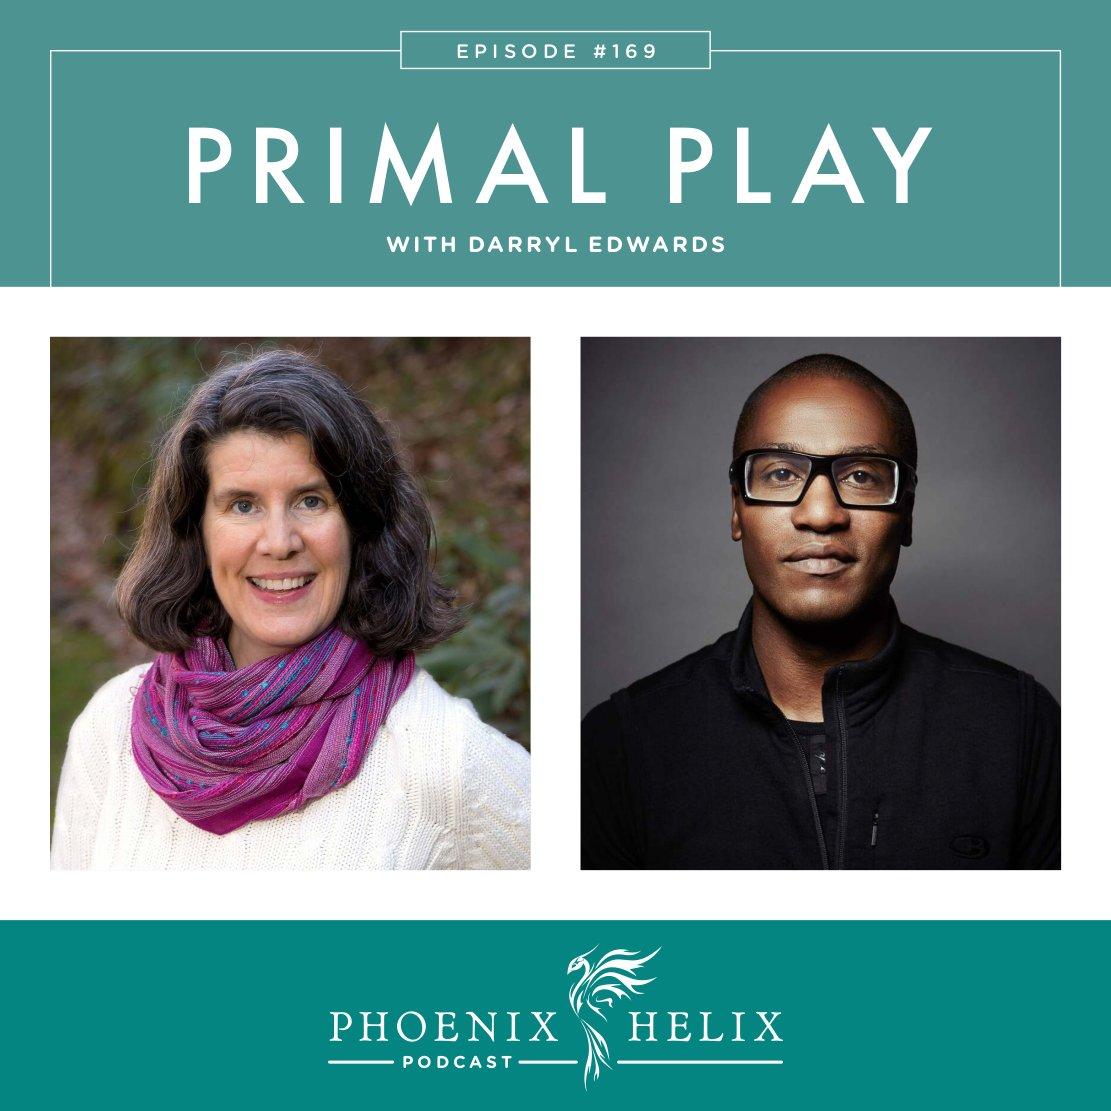 Primal Play with Darryl Edwards | Phoenix Helix Podcast